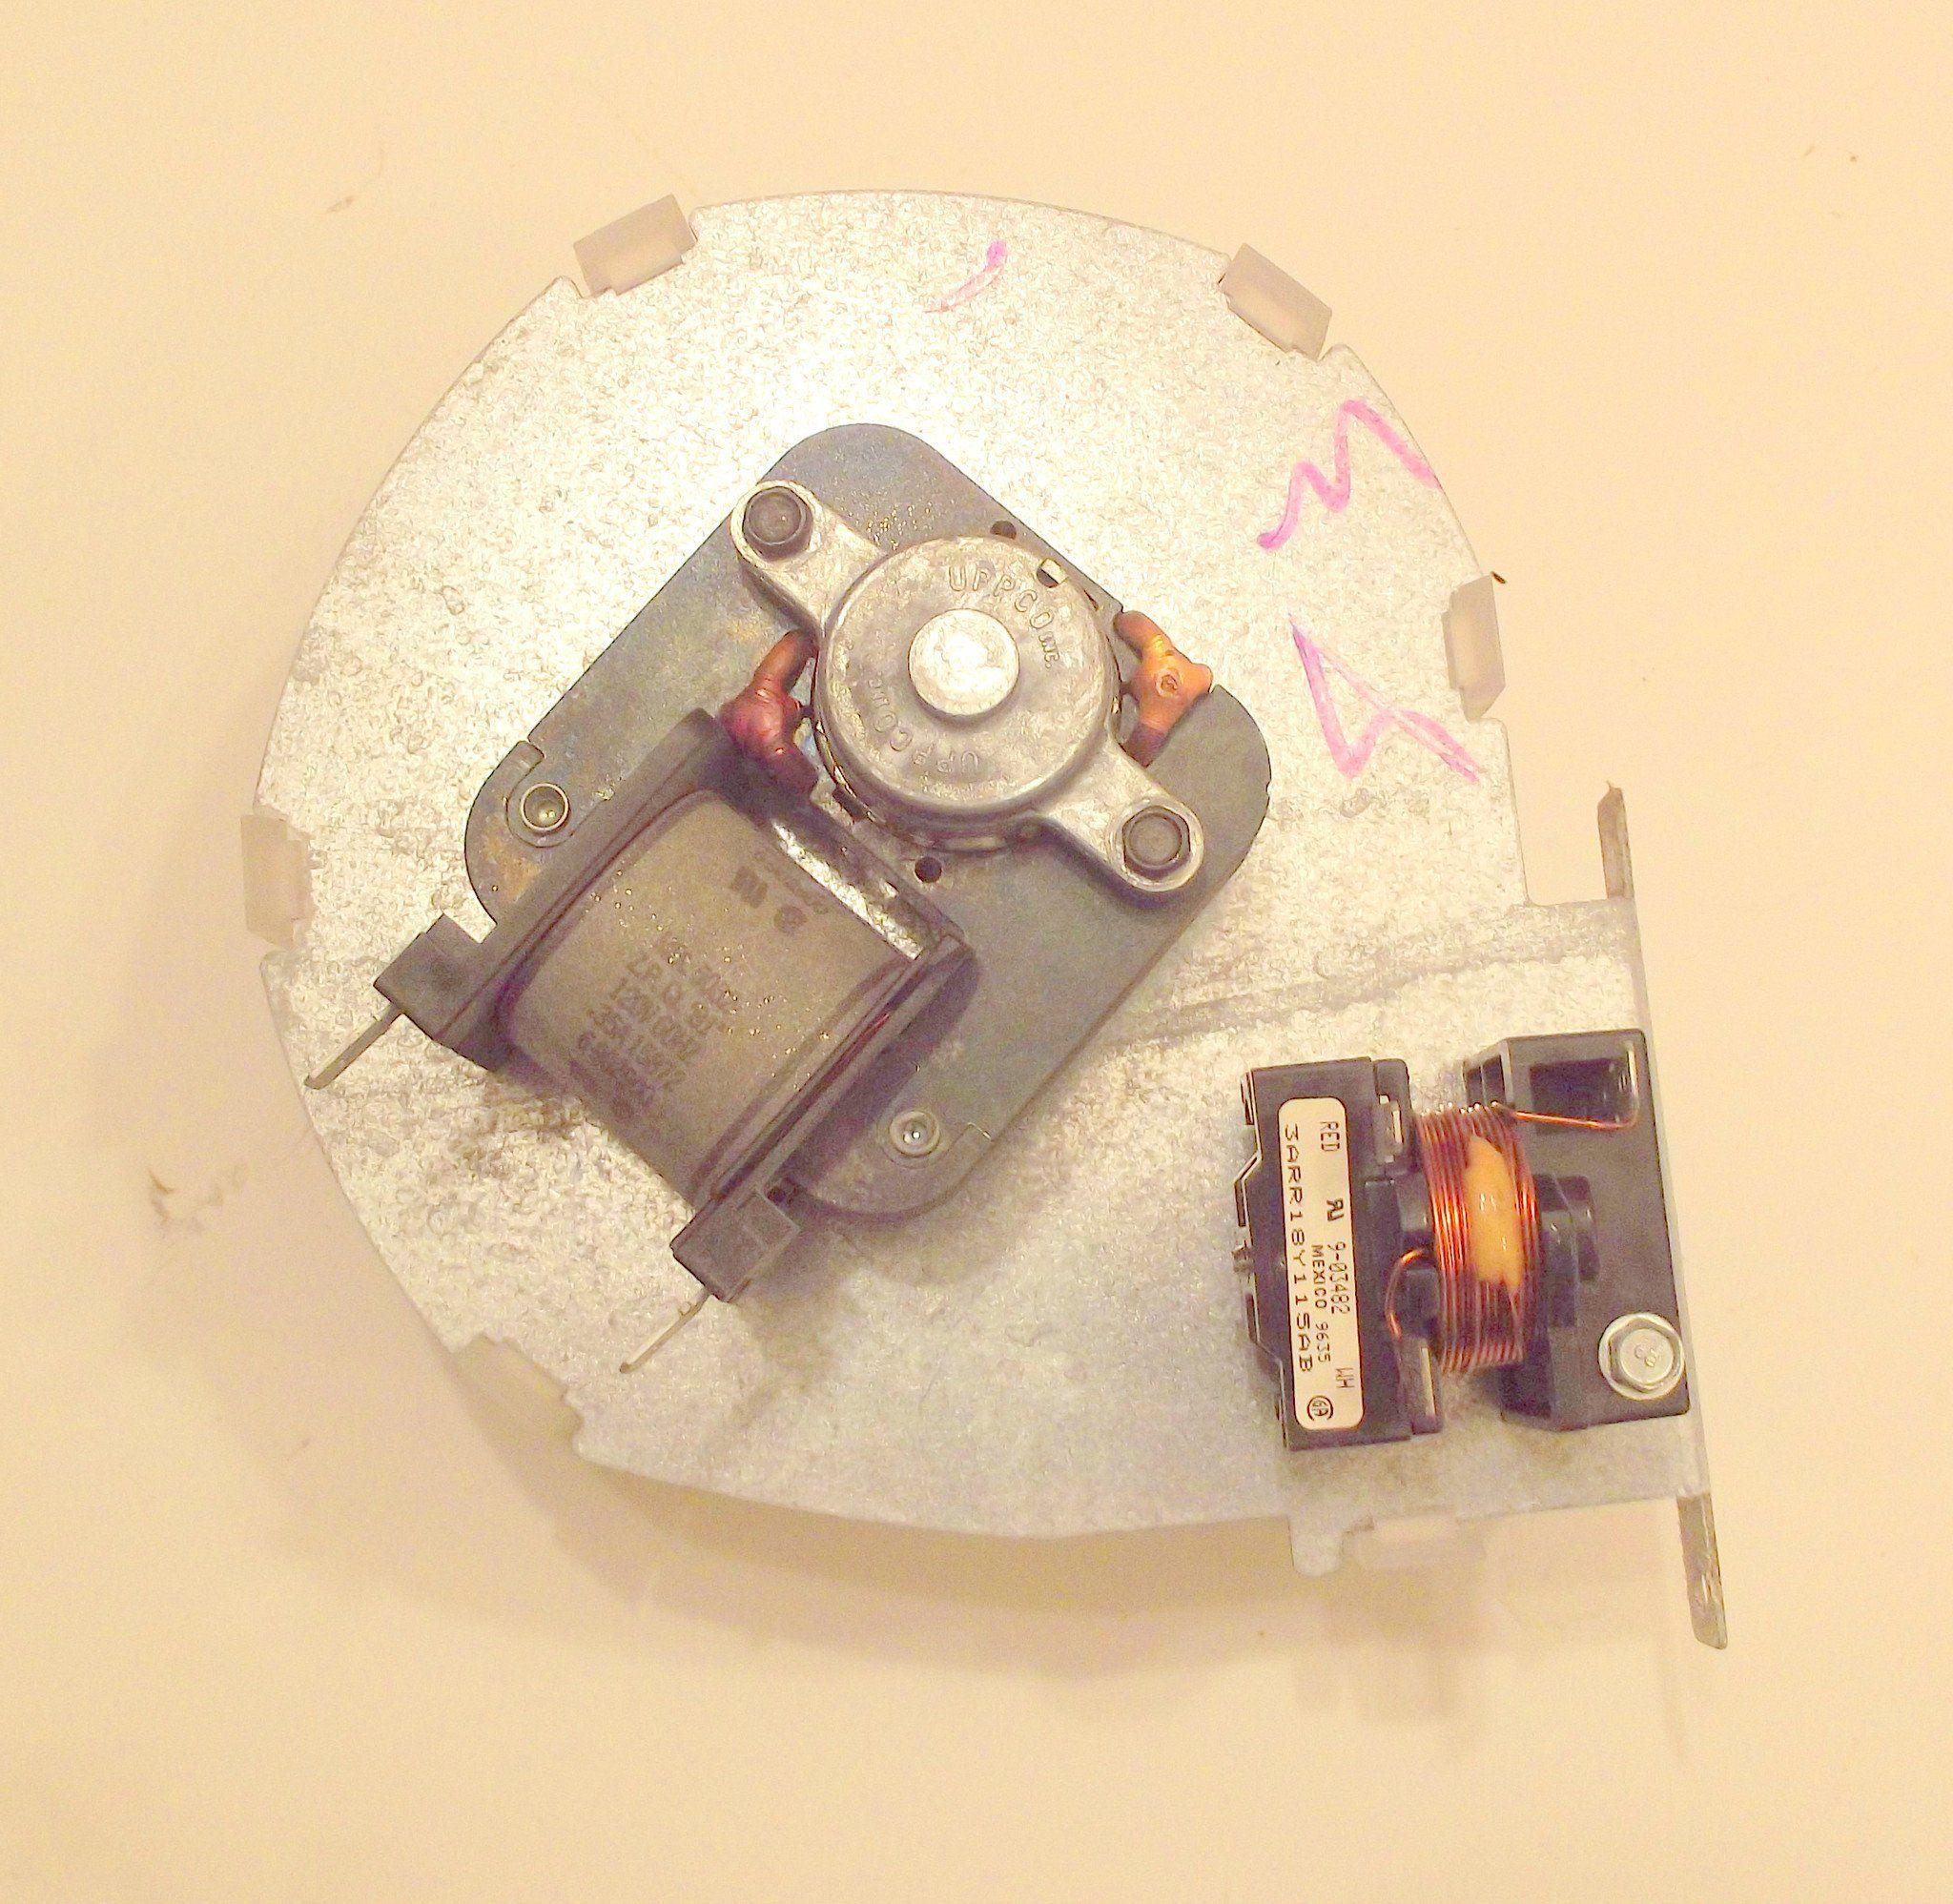 902900 903482 902902 Maytag Dishwasher Fan Motor Blower Assembly Motor Blower Maytag Dishwasher Fan Motor